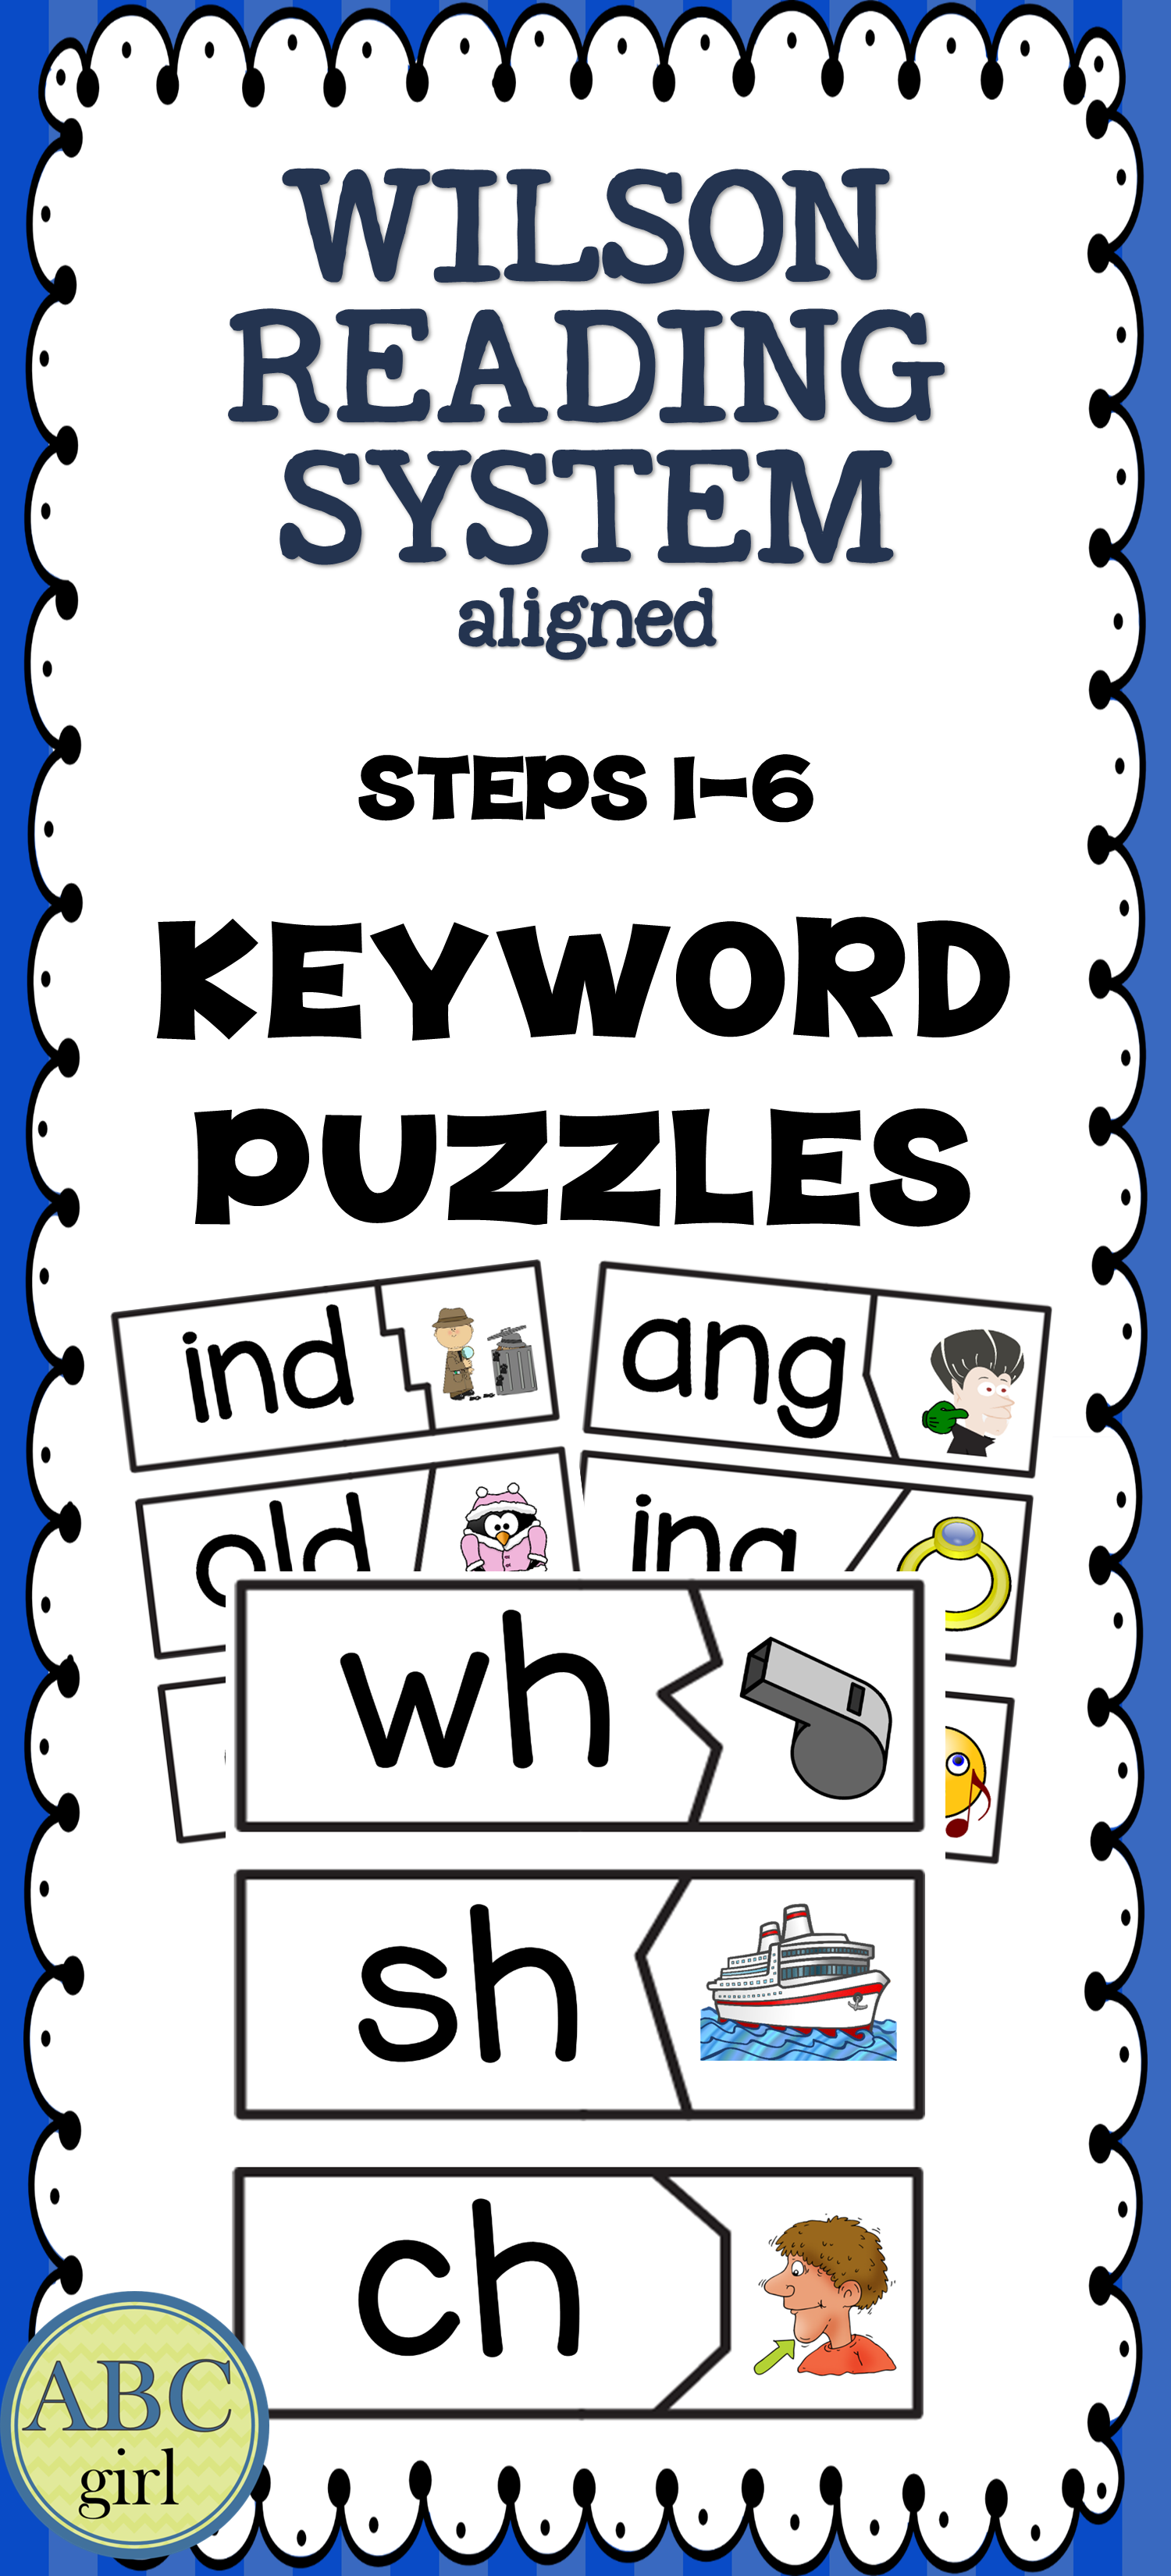 small resolution of Wilson Reading System® Aligned Keyword Puzzles Steps 1-6.  #wilsonreadingsystem #fundations #wilsonr…   Wilson reading system